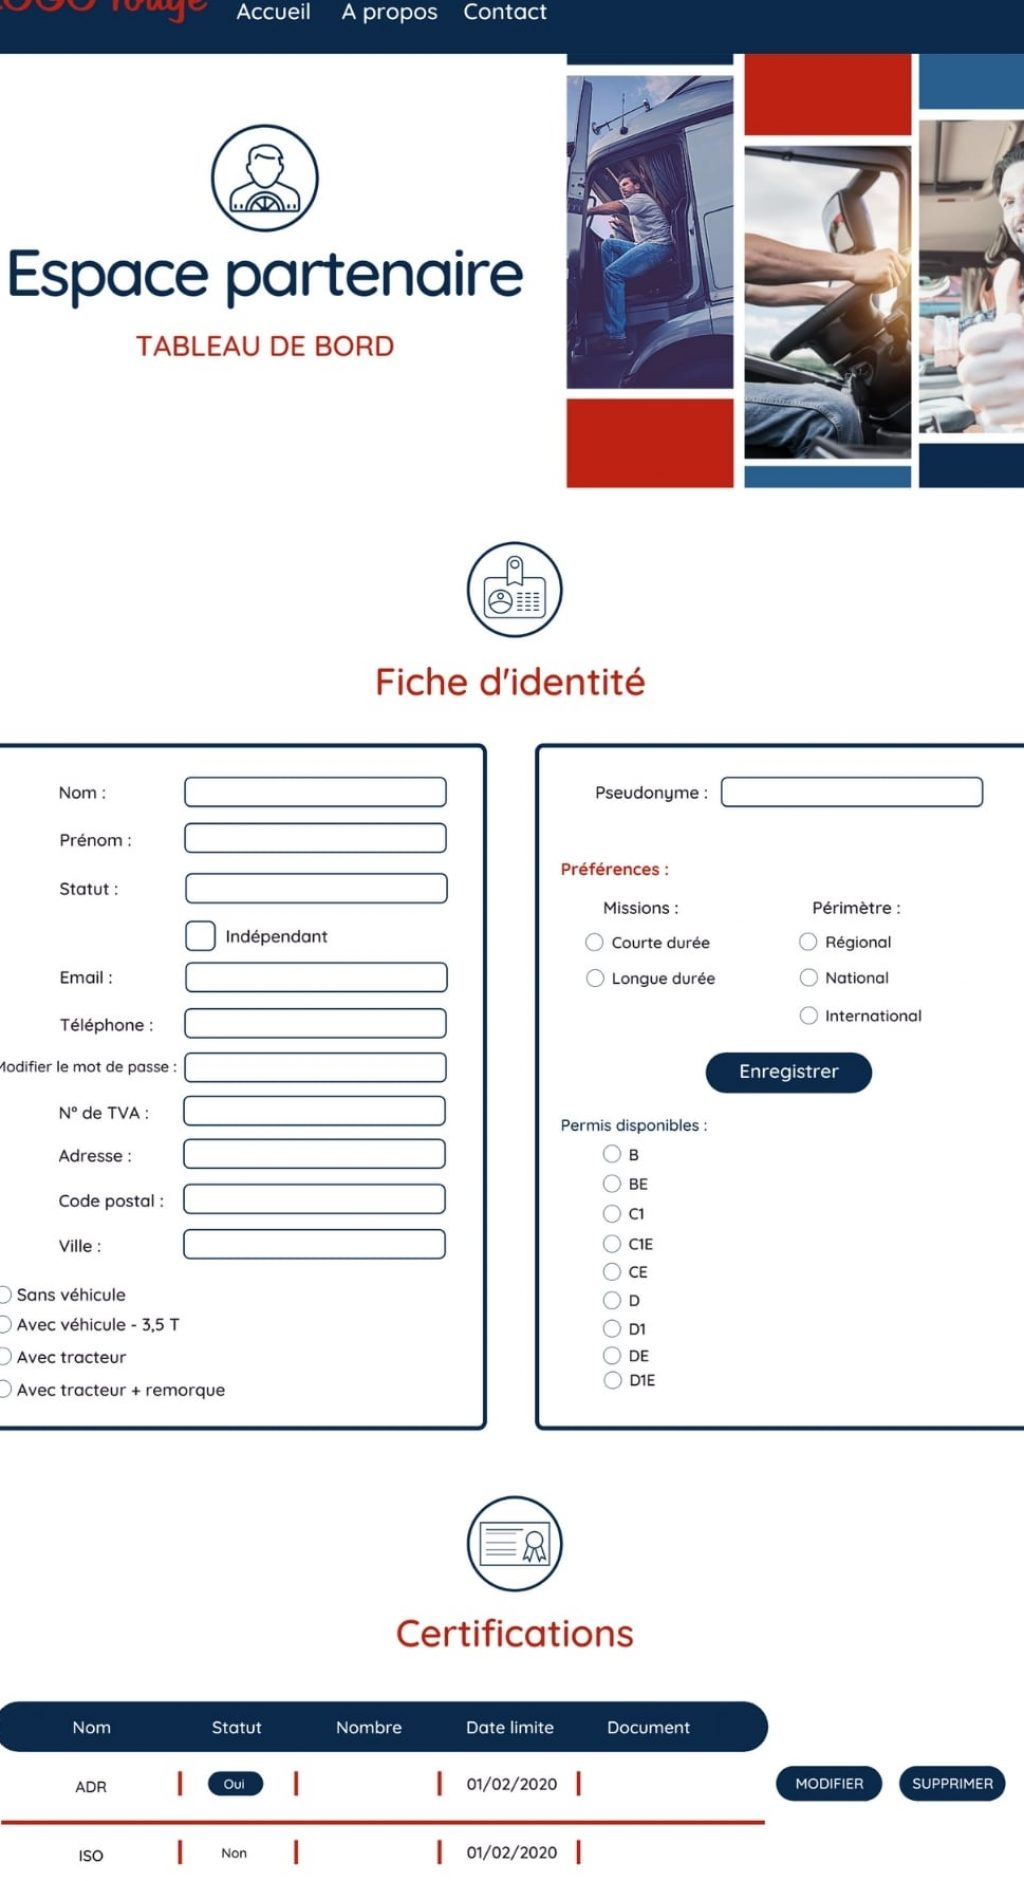 freelance mission webdesign lille rouen plateforme web